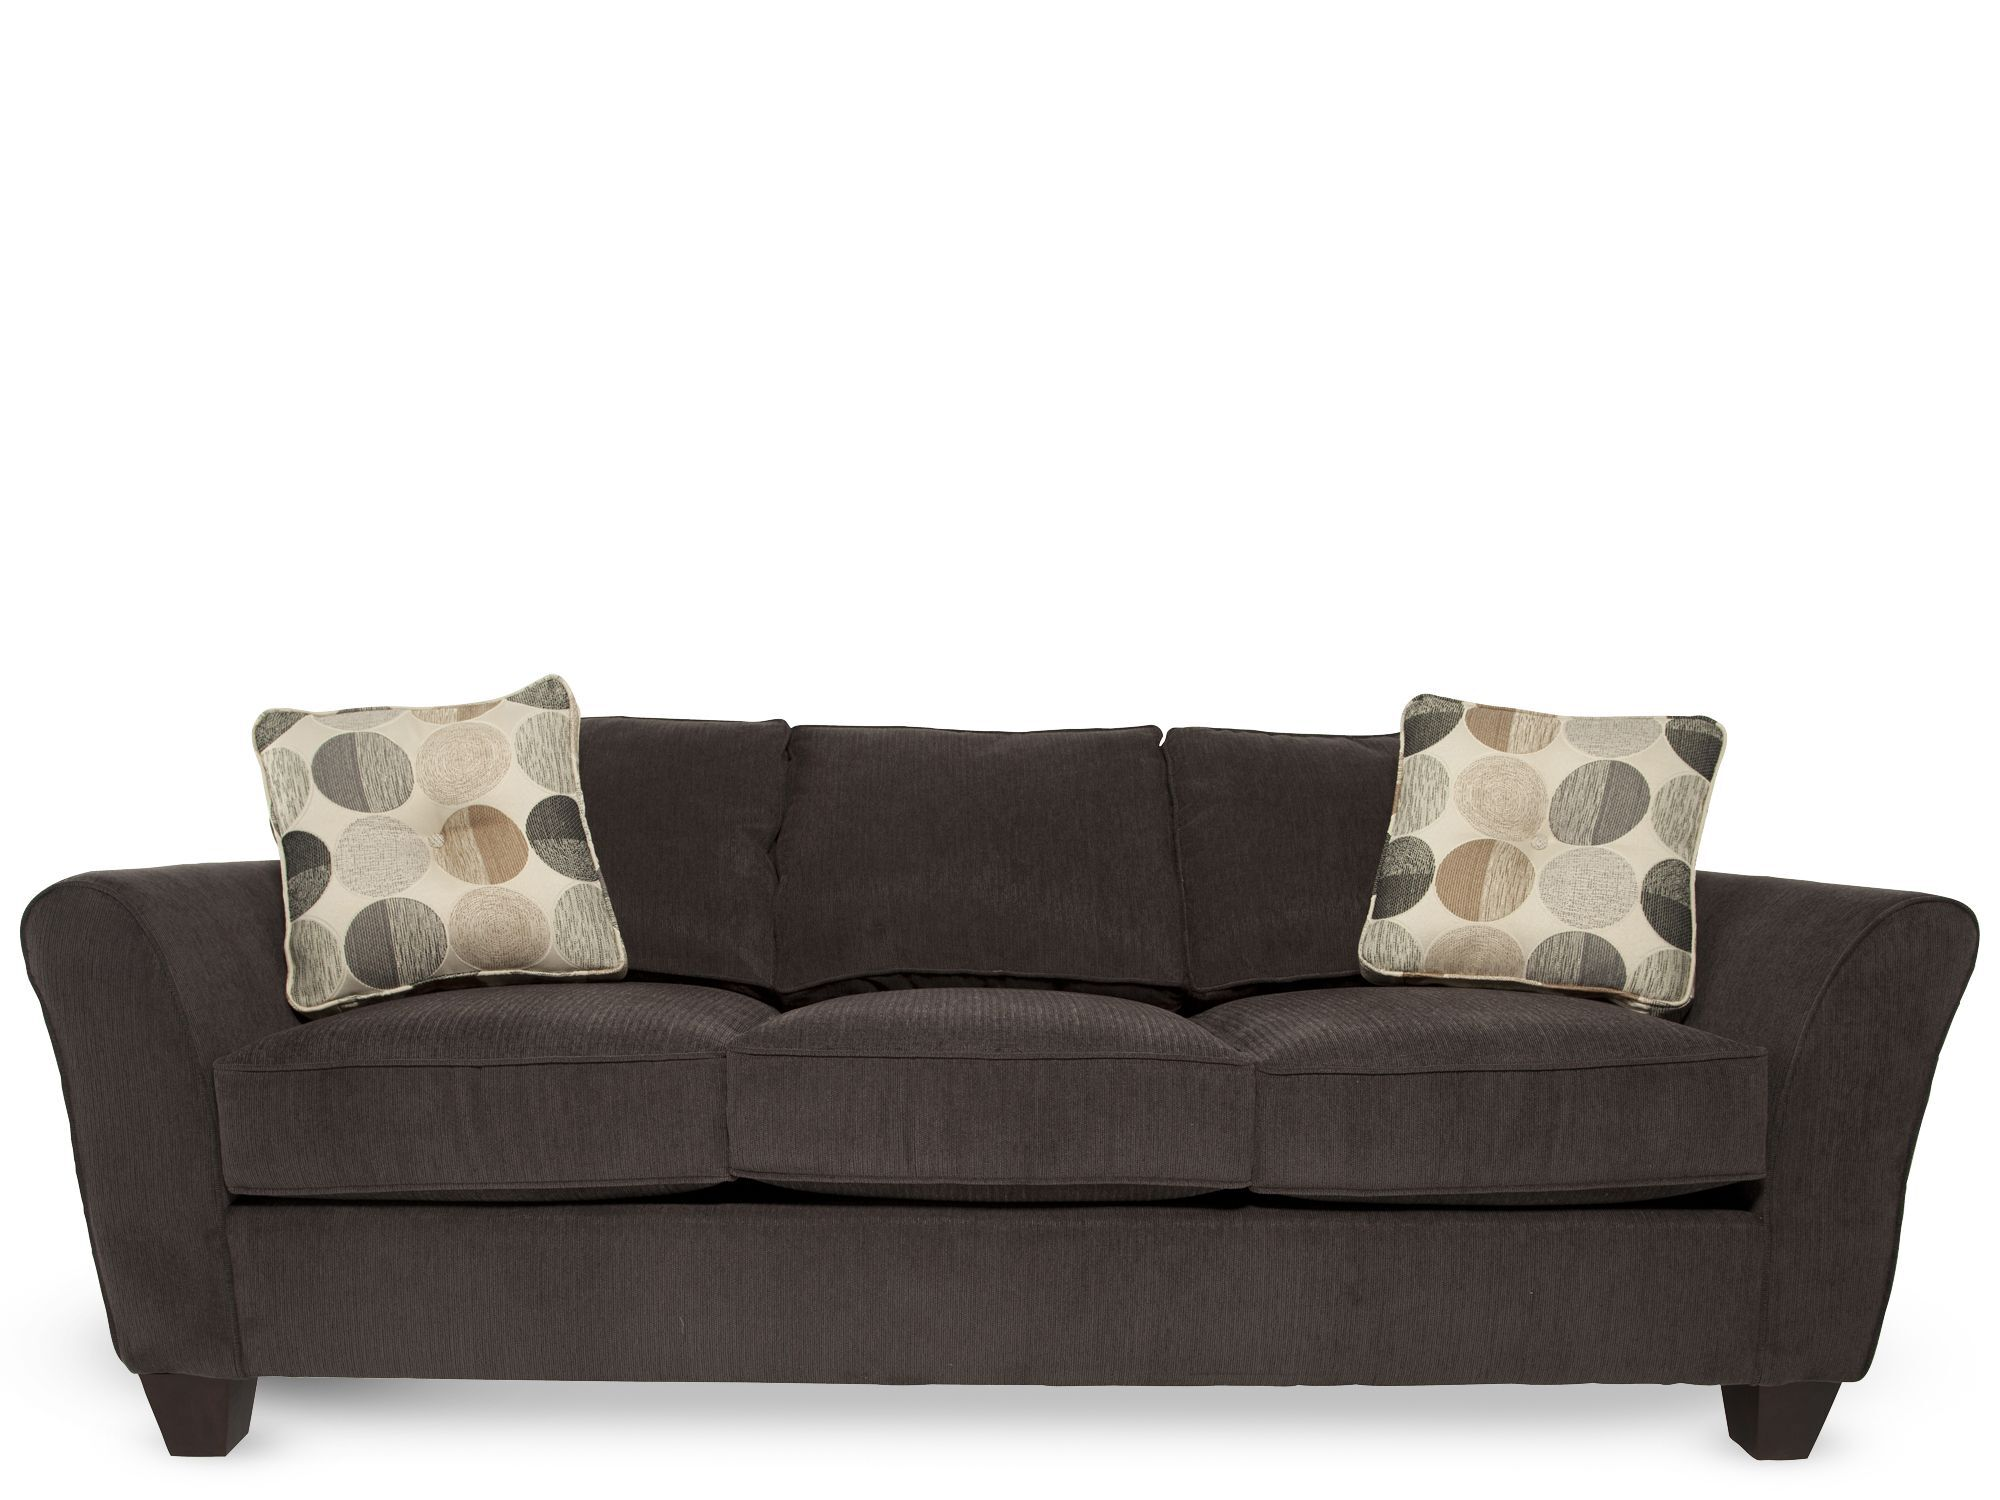 Microfiber Corduroy 87u0026quot; Sofa In Charcoal